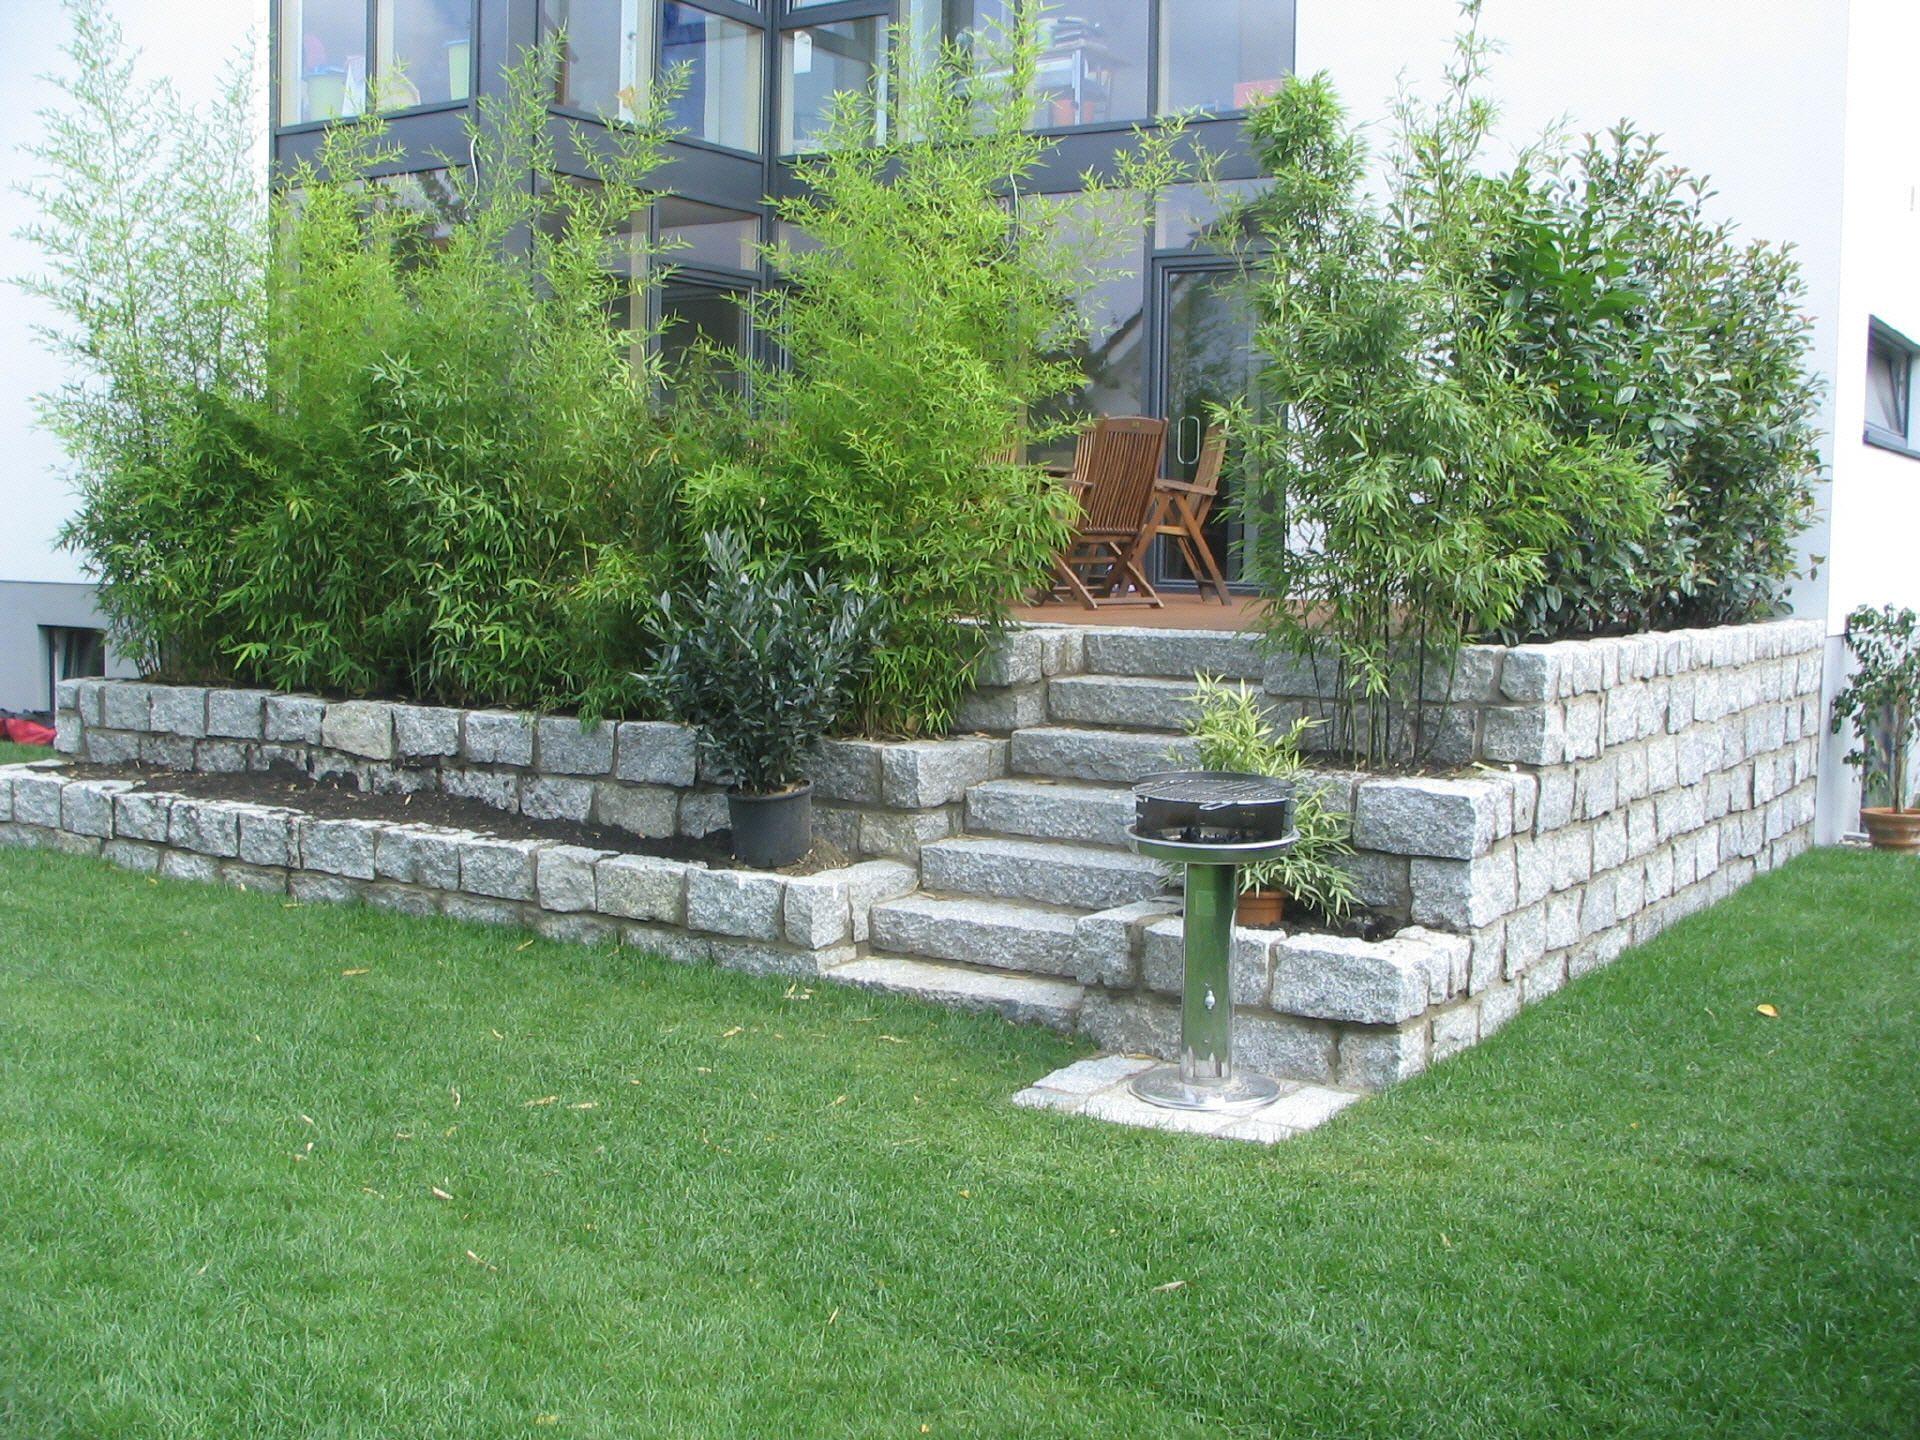 Gartengestaltung Terrasse Hoher Als Garten Garten Gestaltung Ideen